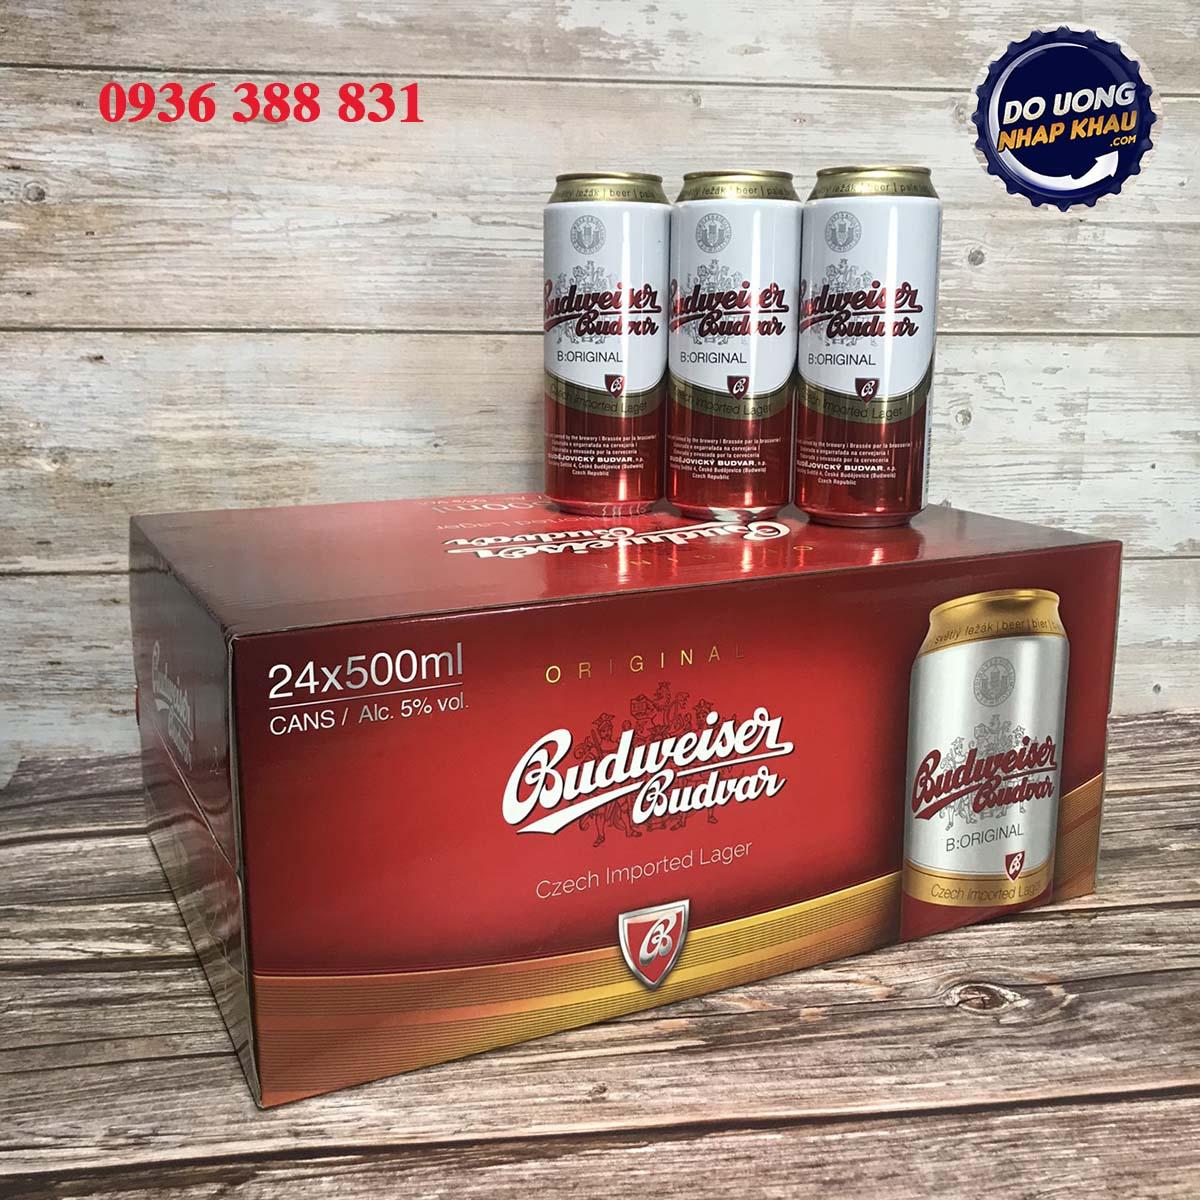 Bia Budweiser Budvar lon 500ml